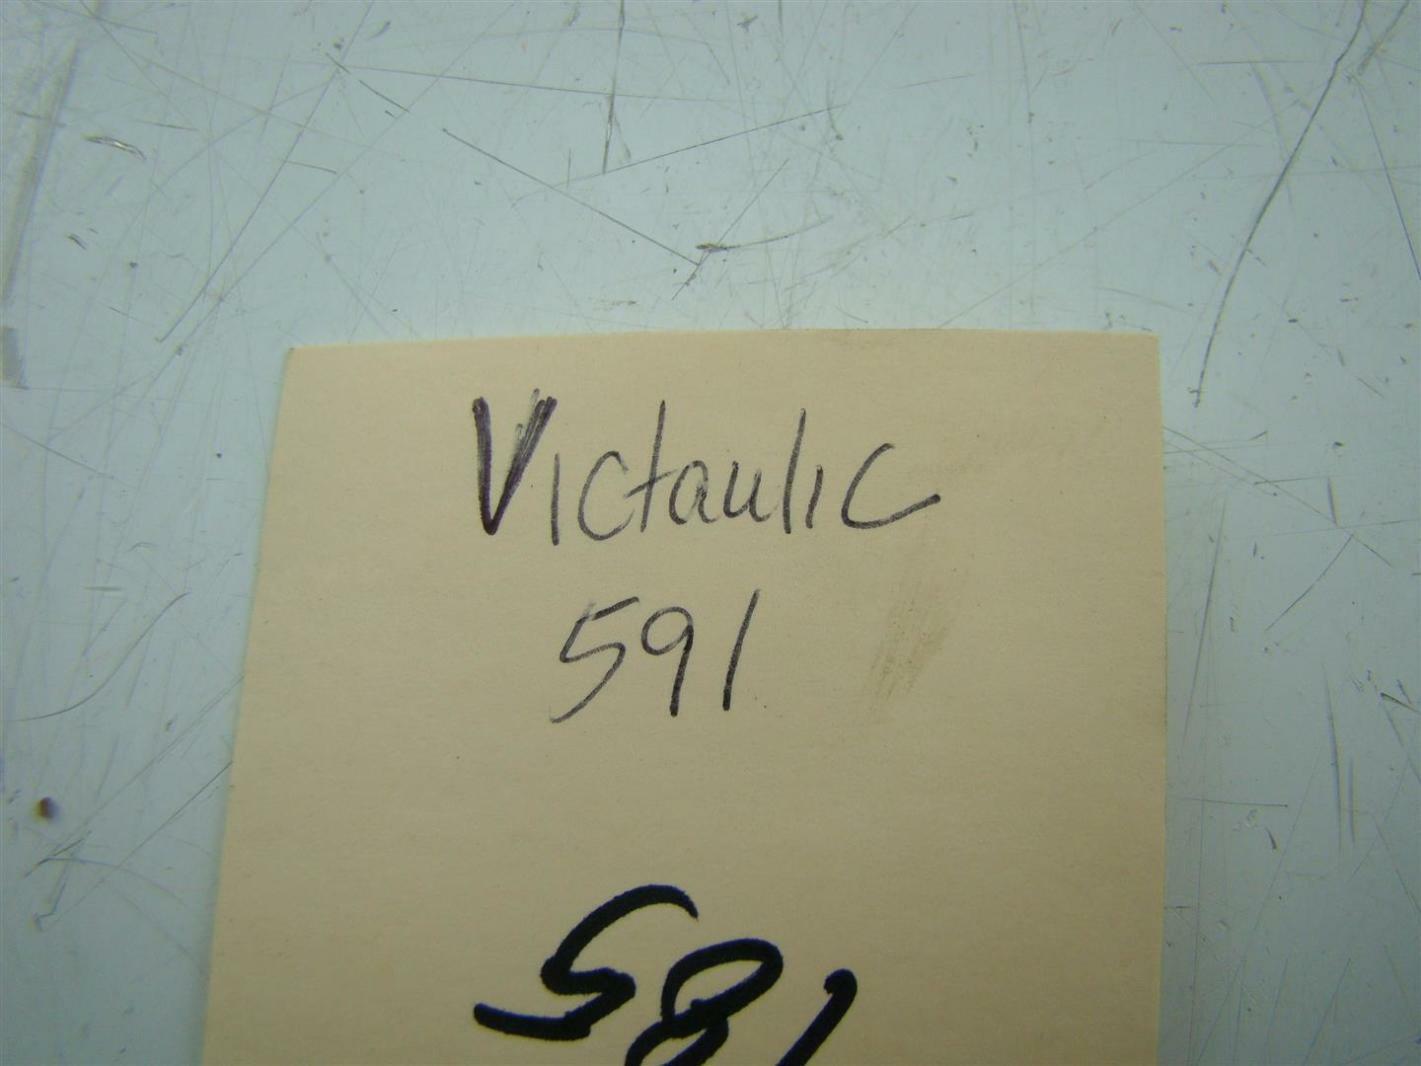 VICTAULIC - VIC-PRESS SS P586 91 DEG  ELBOW 1 1/2